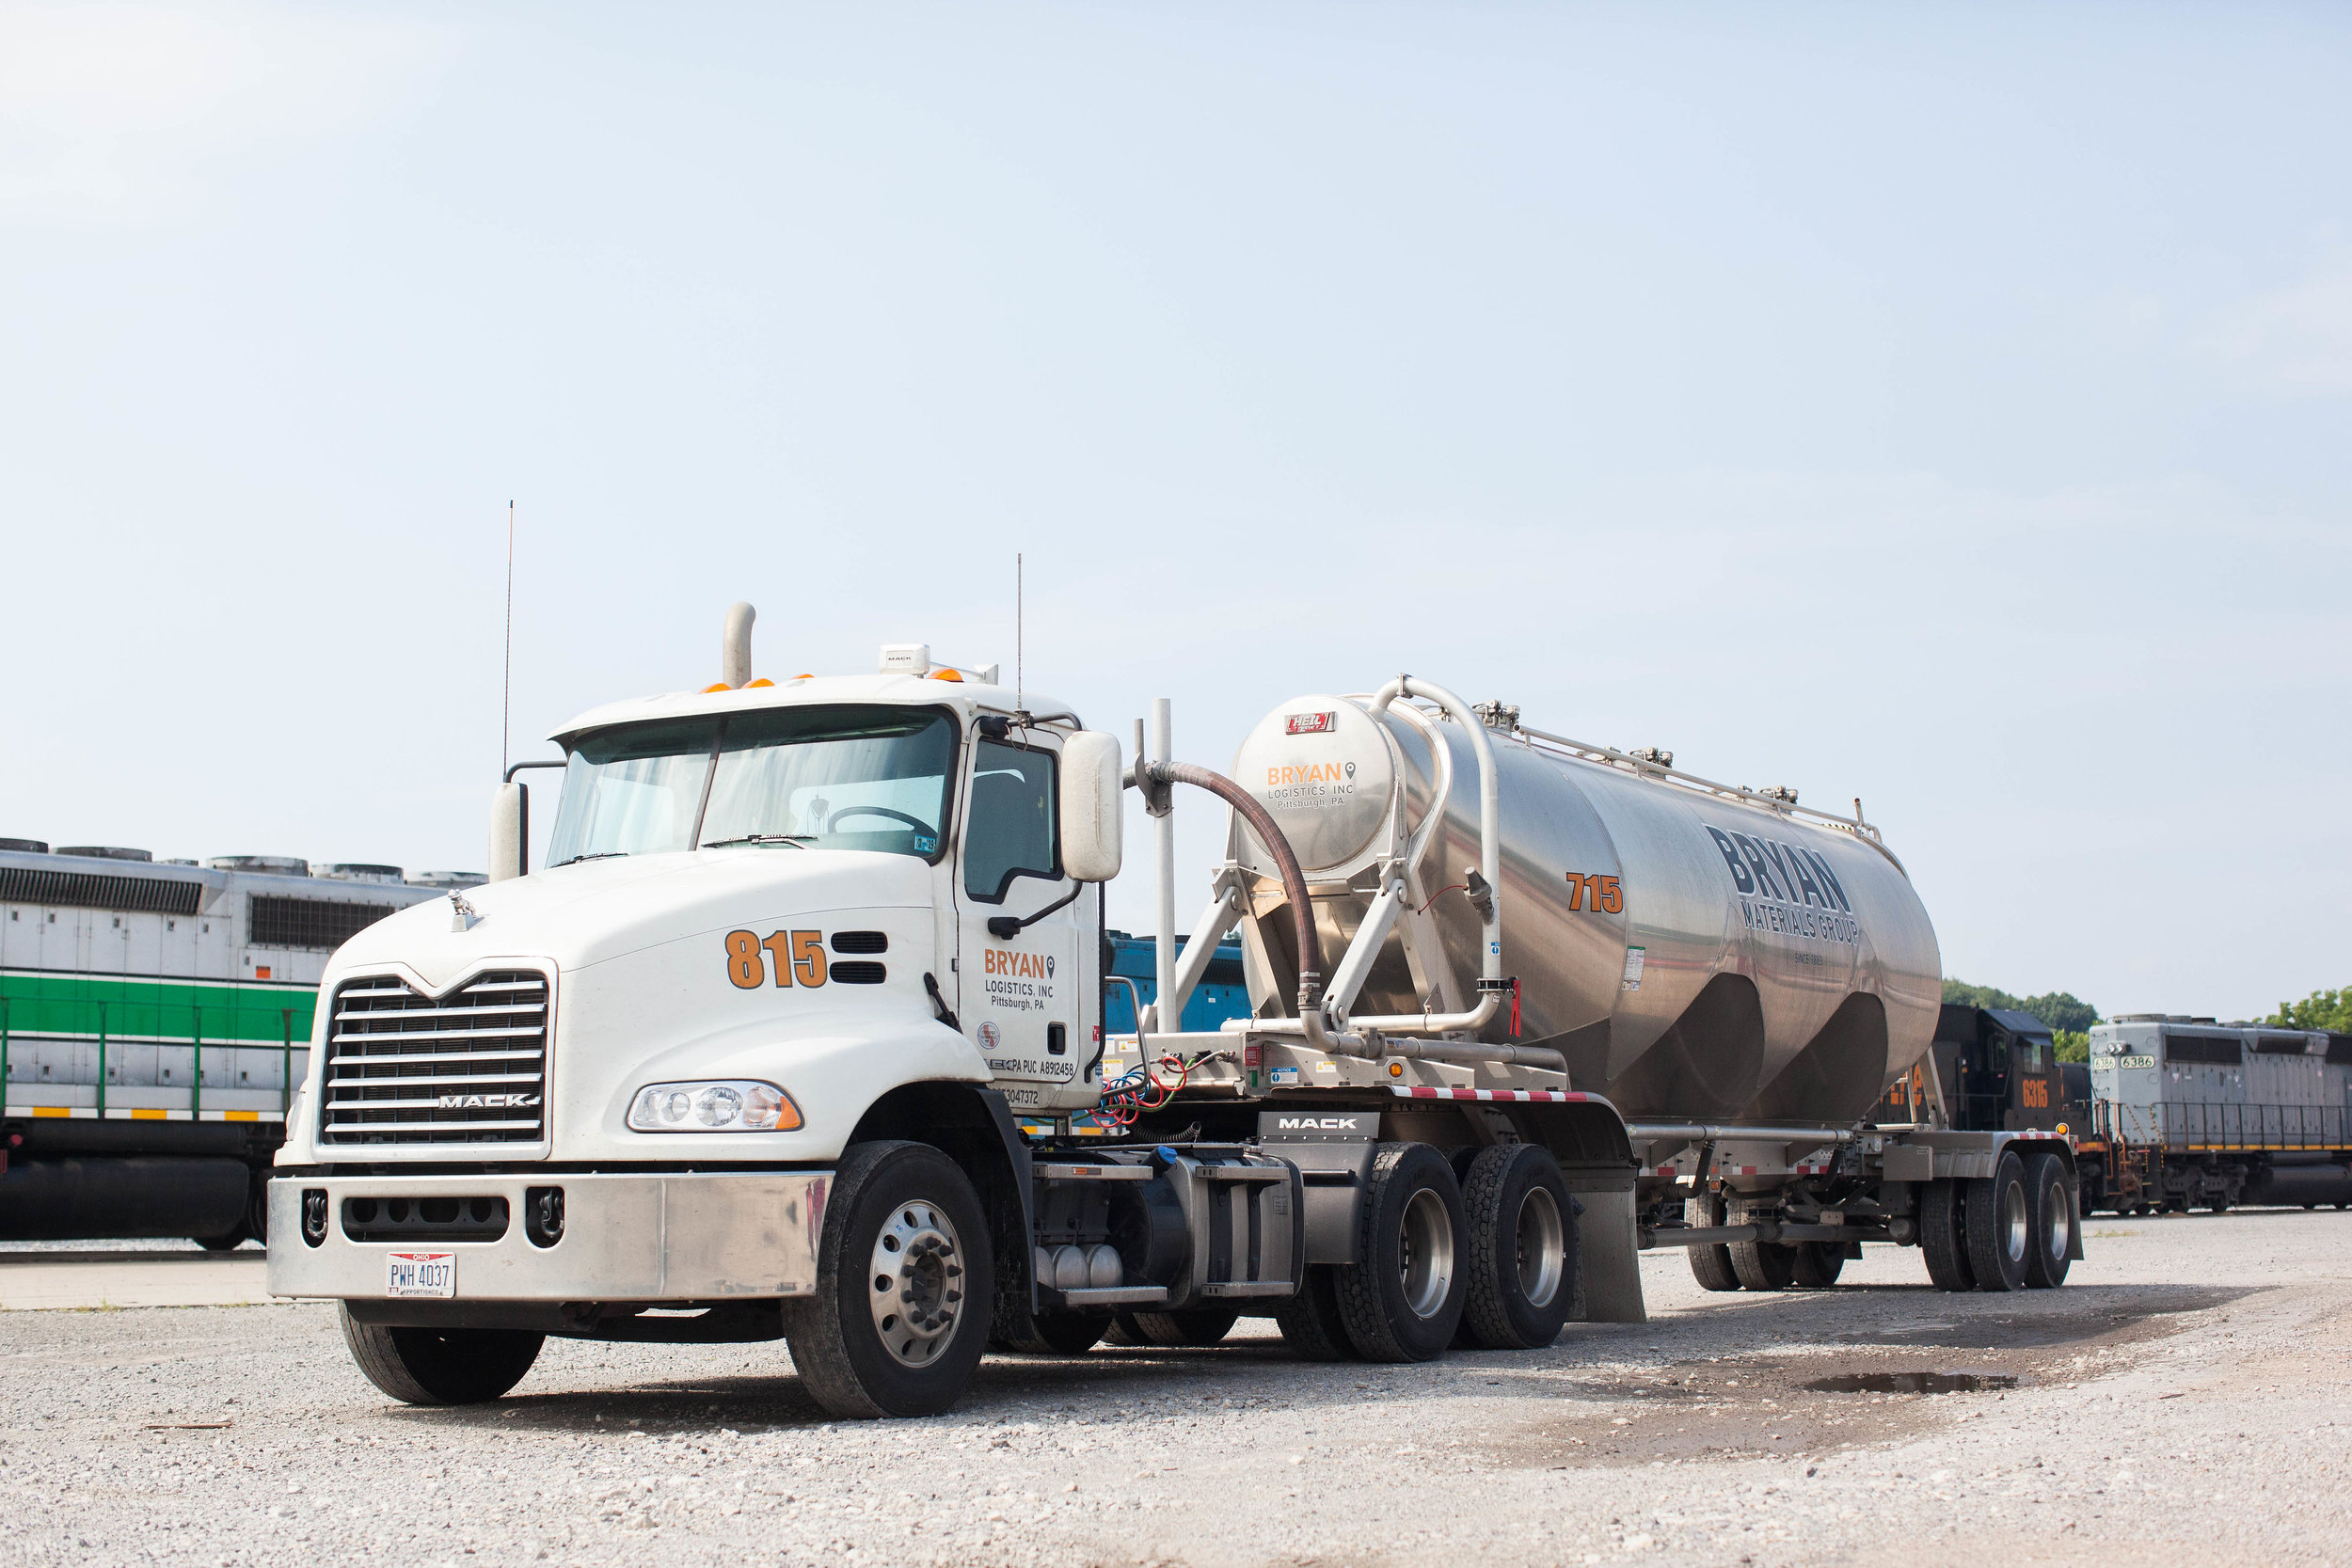 Bryan Logistics Truck.jpg